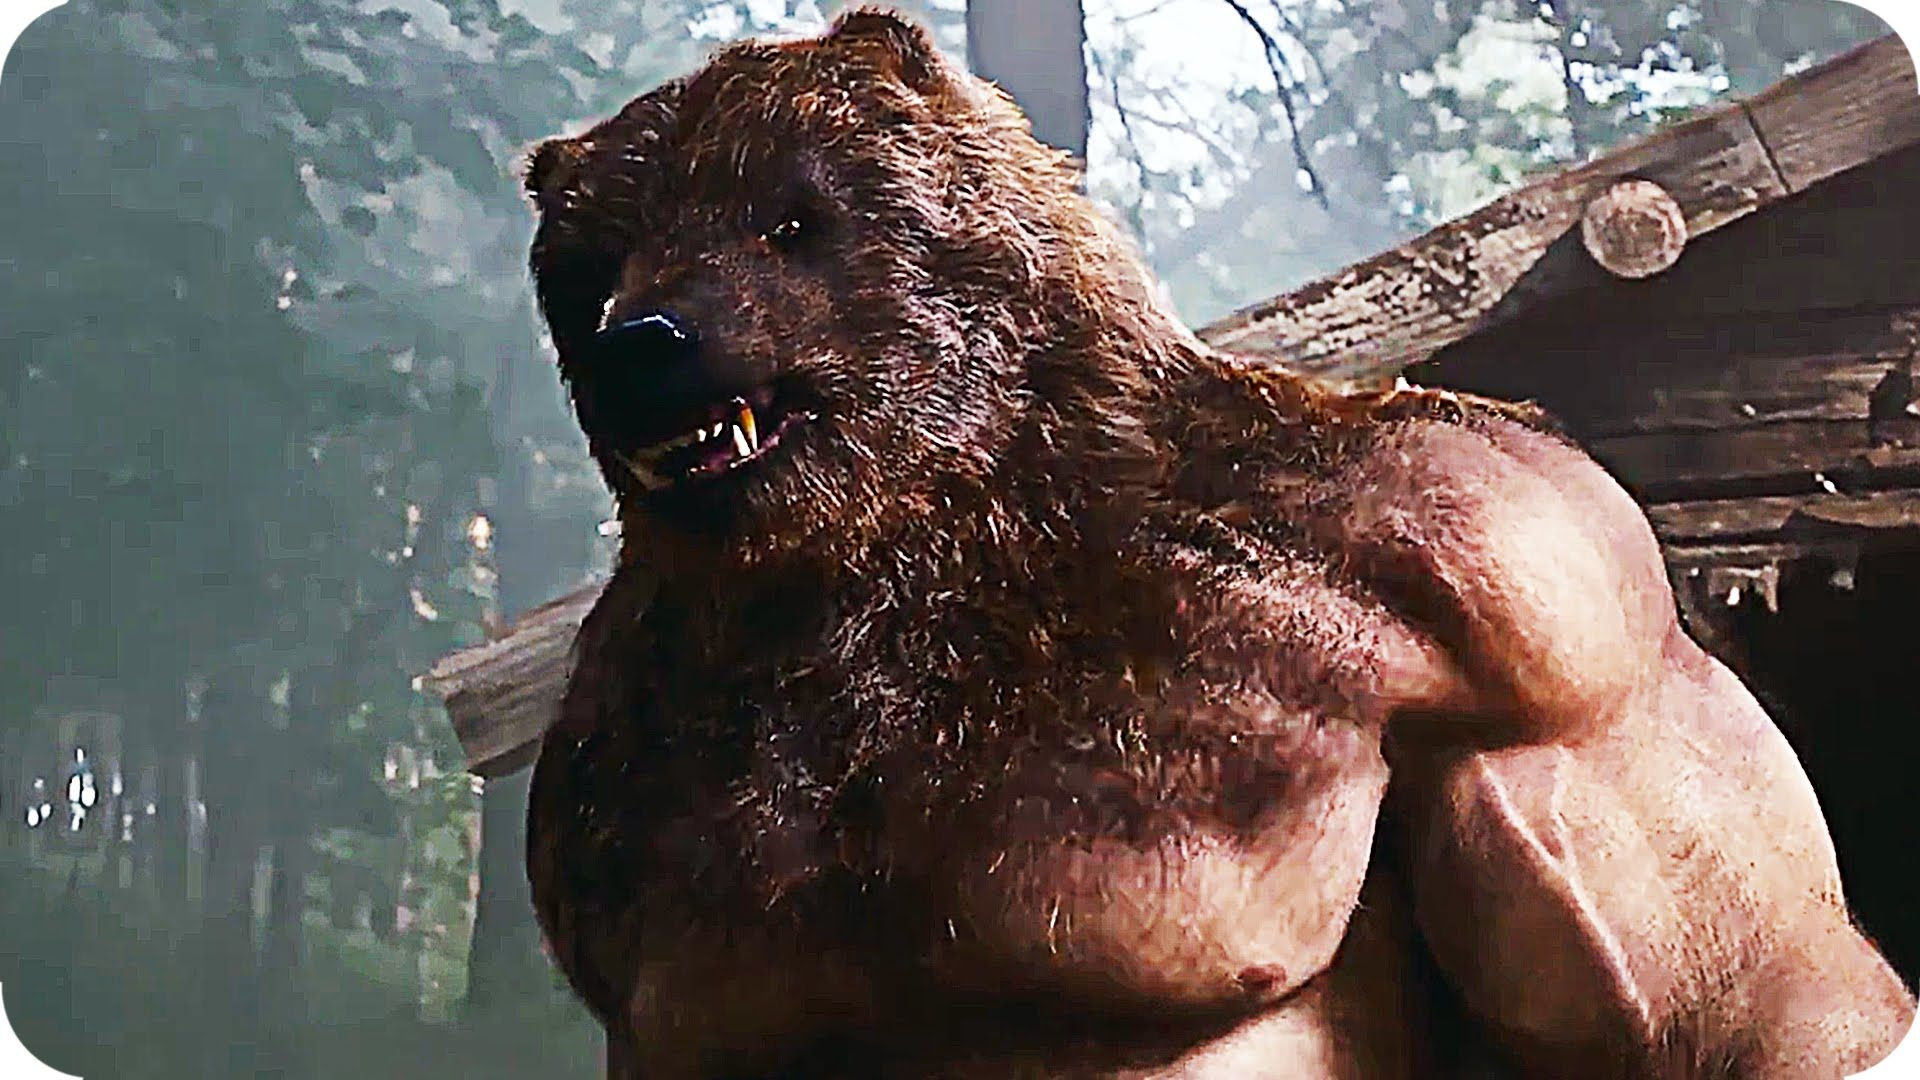 GUARDIANS Teaser Trailer 3 (2017) Russian Superhero Movie | HORROR ...